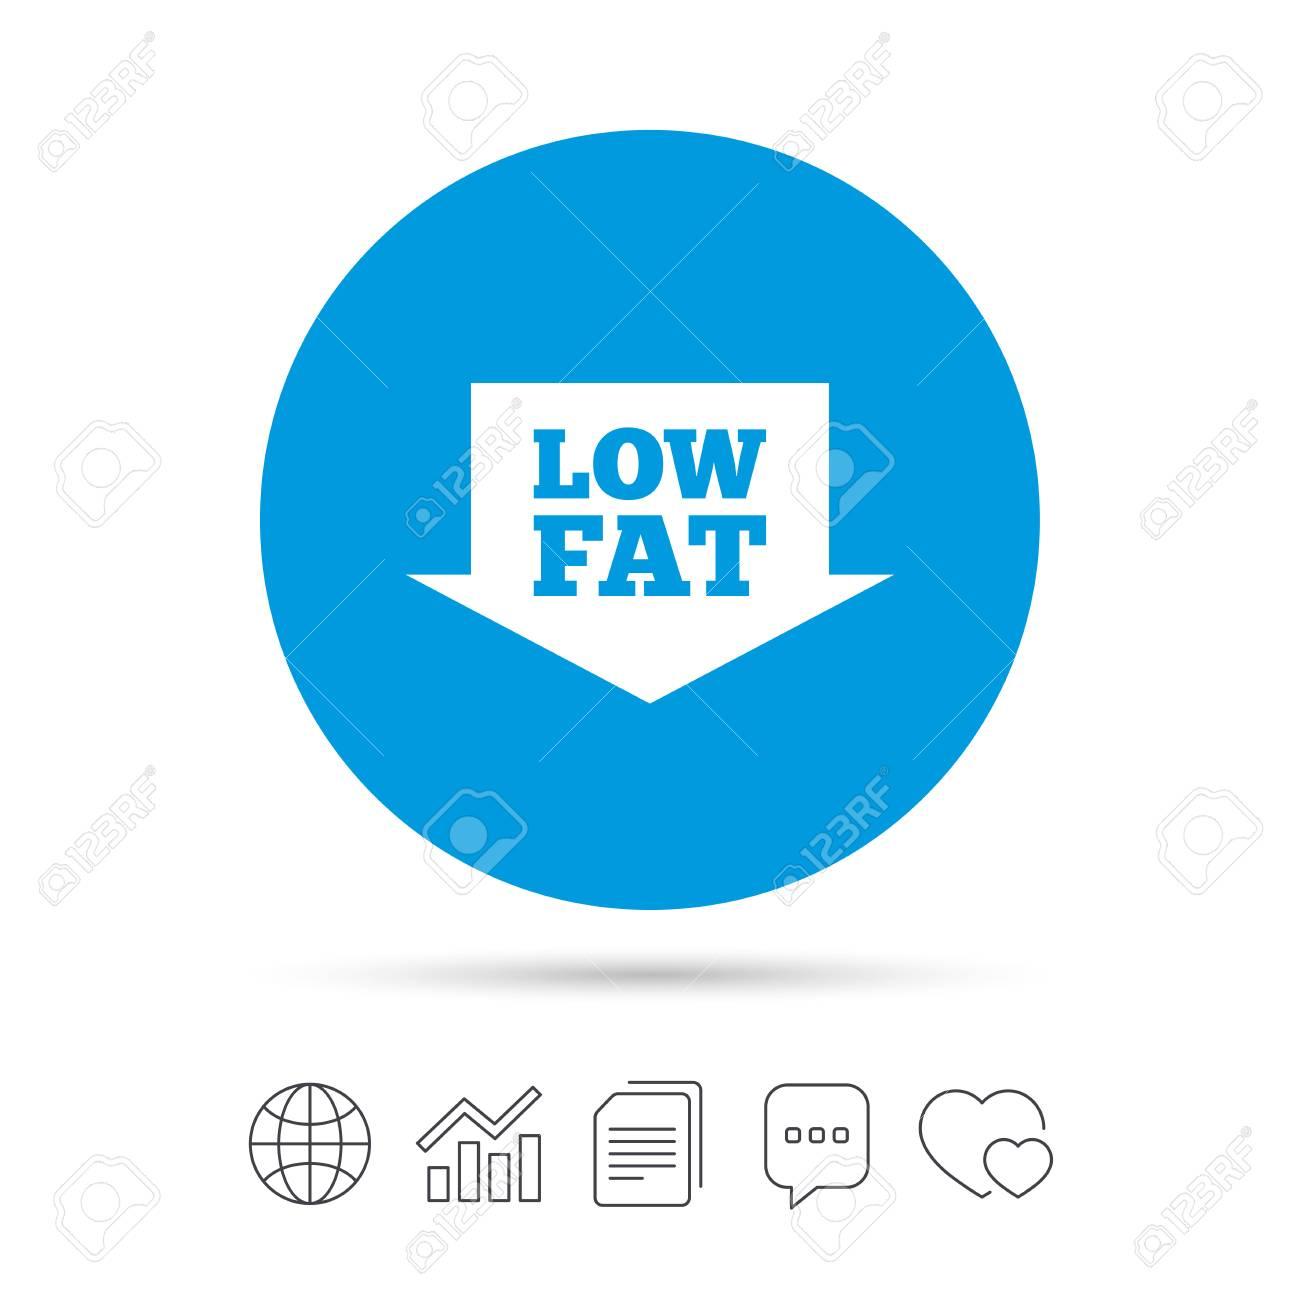 Low fat sign icon salt sugar food symbol with arrow copy files low fat sign icon salt sugar food symbol with arrow copy files biocorpaavc